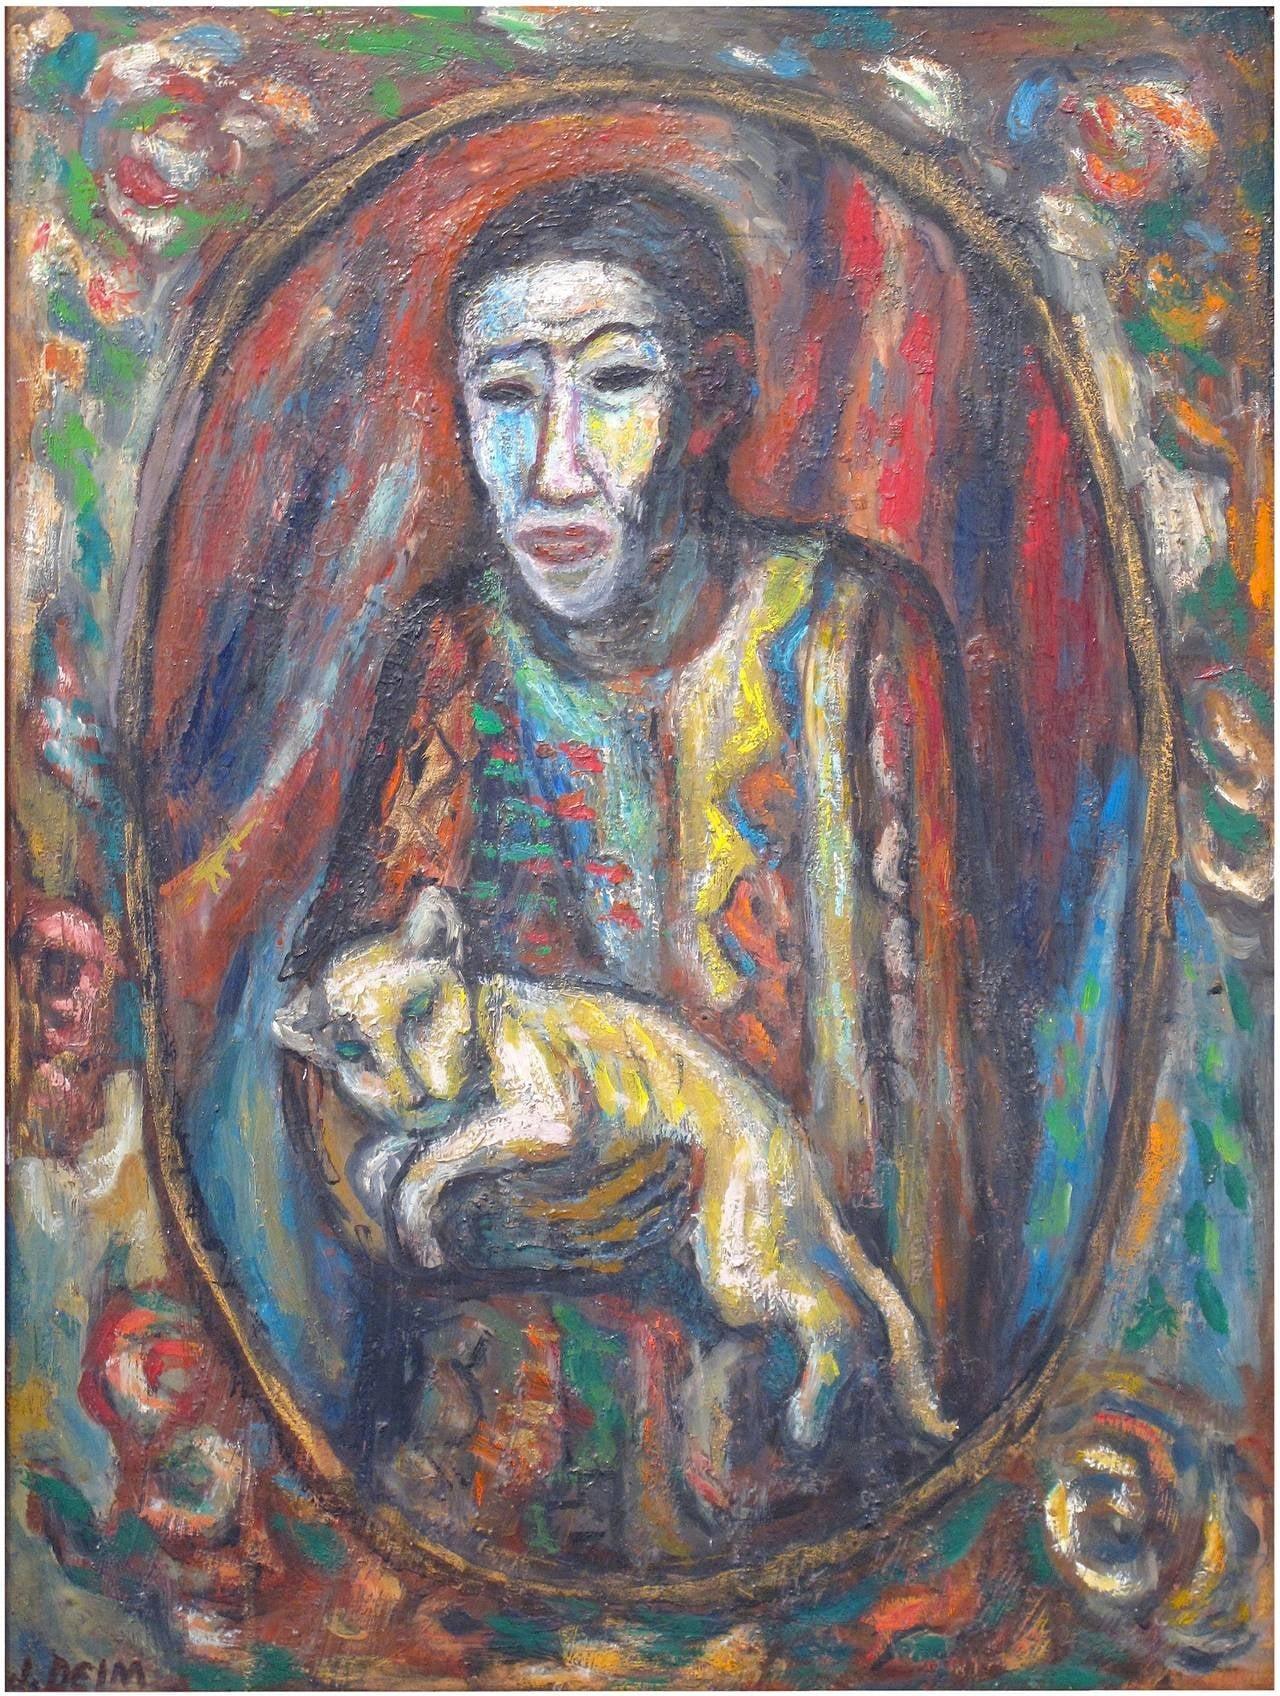 Ghost Bird: The Life and Art of Judith Deim